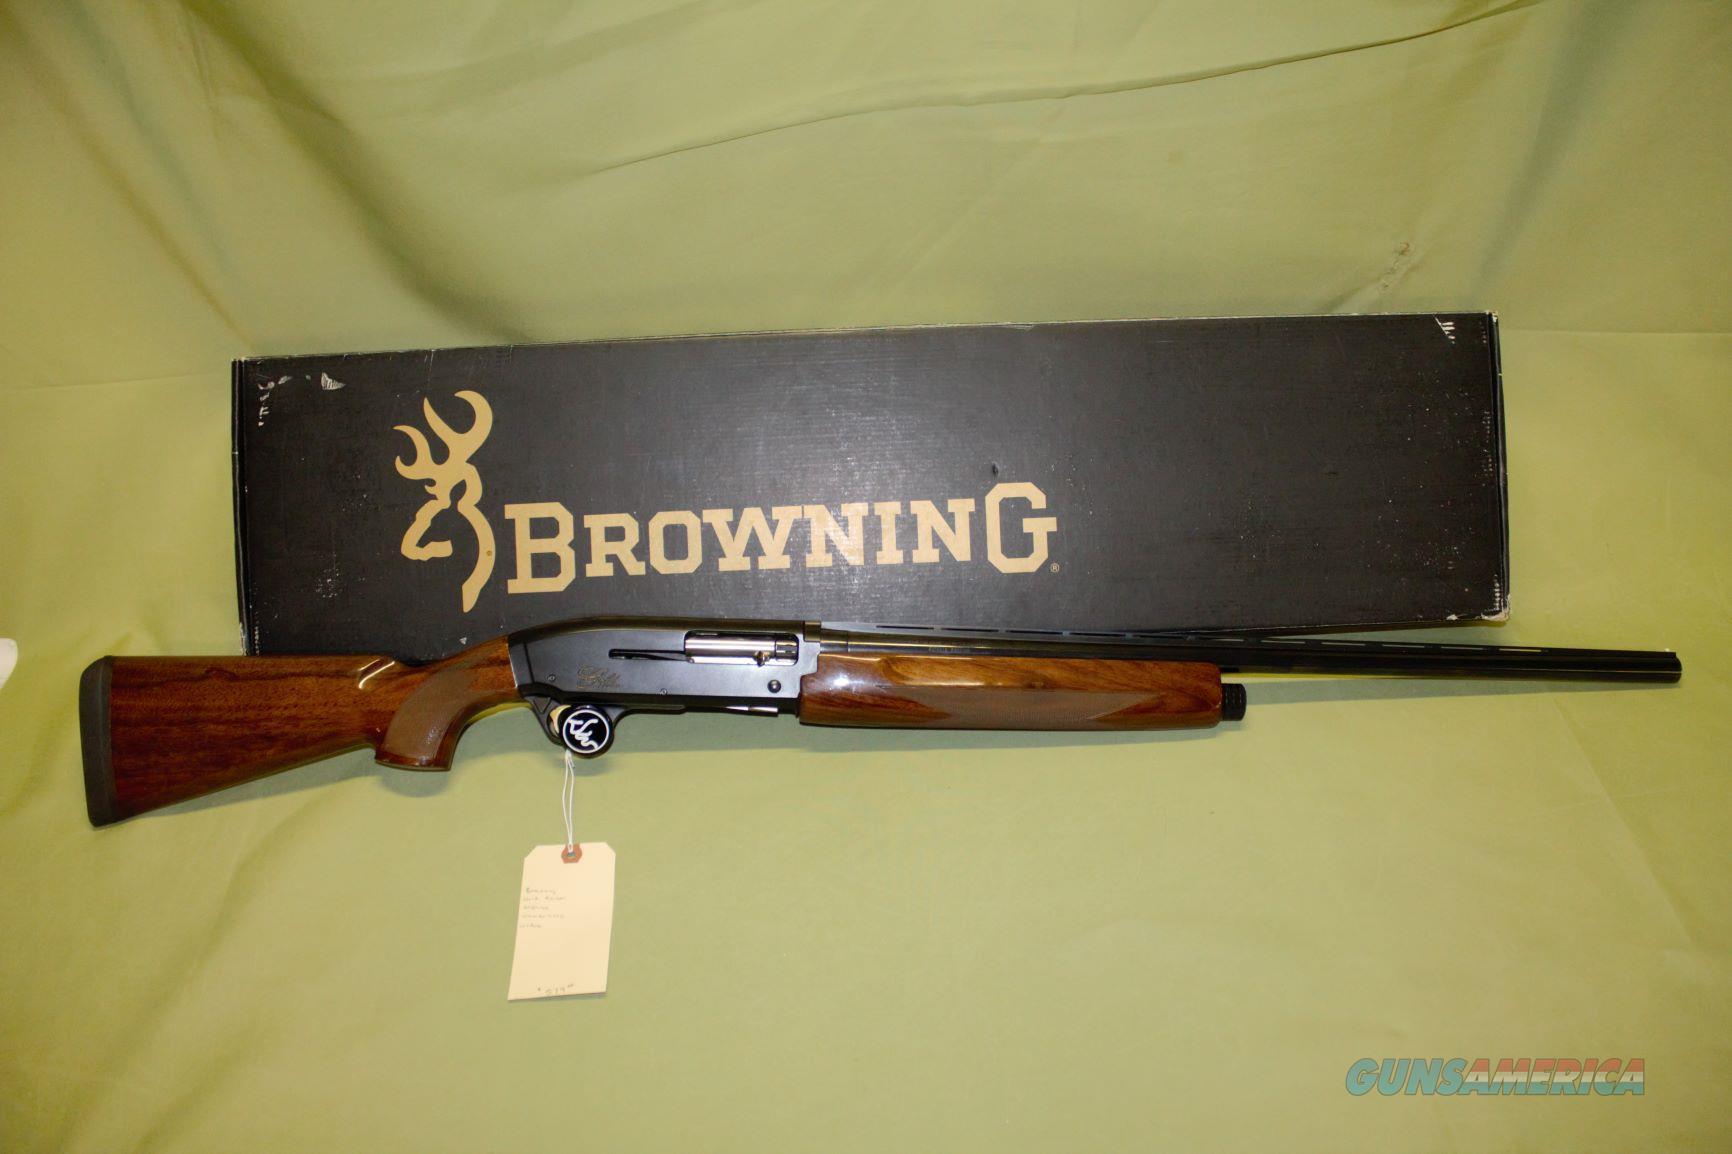 Browning Gold Hunter 20 Gauge Grade I   Guns > Shotguns > Browning Shotguns > Autoloaders > Hunting